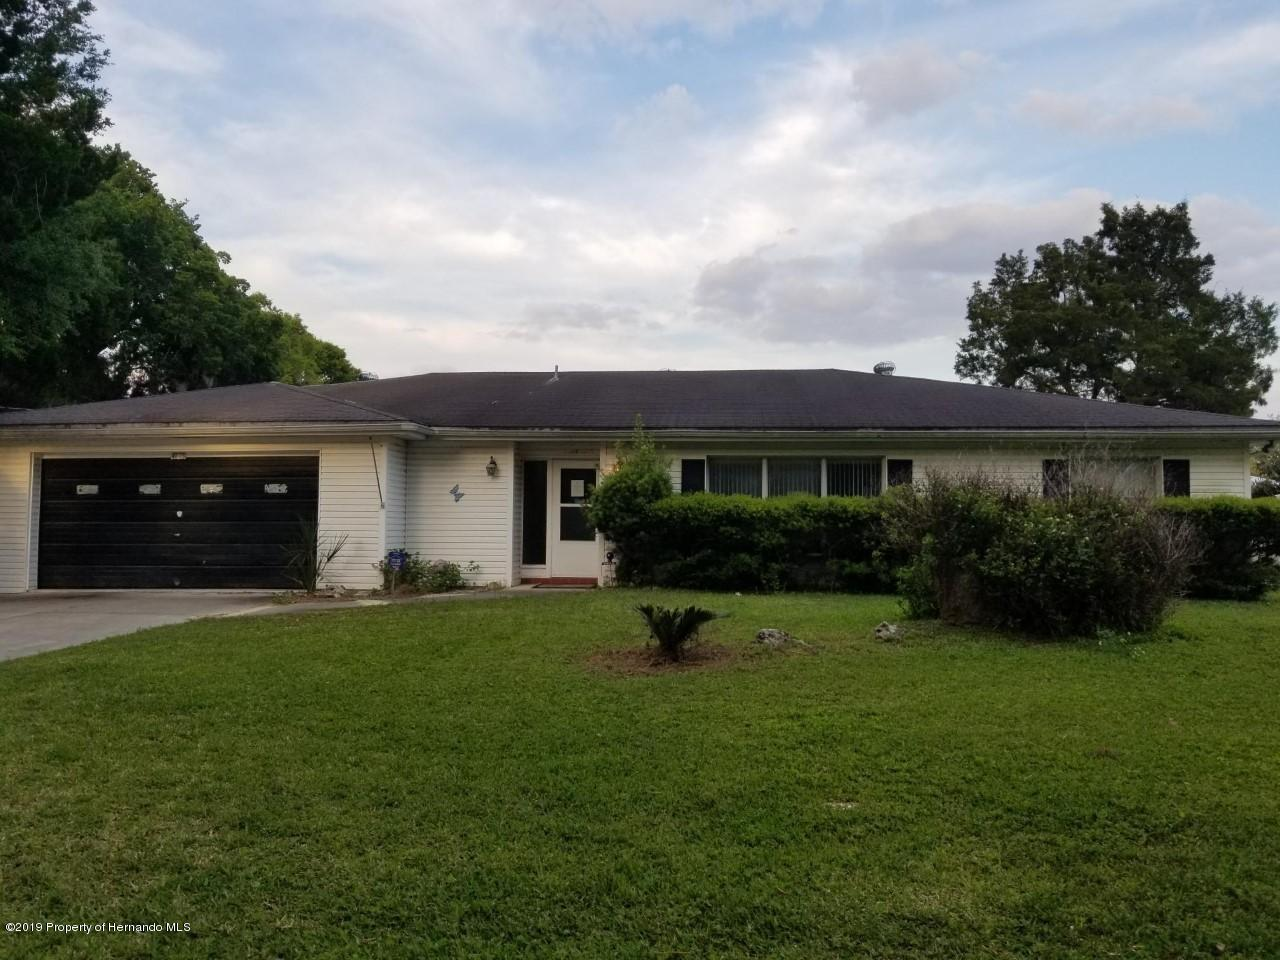 4105 S Taylor Terrace, Homosassa, Florida 34448, 3 Bedrooms Bedrooms, ,2 BathroomsBathrooms,Residential,For Sale,S Taylor,2200579